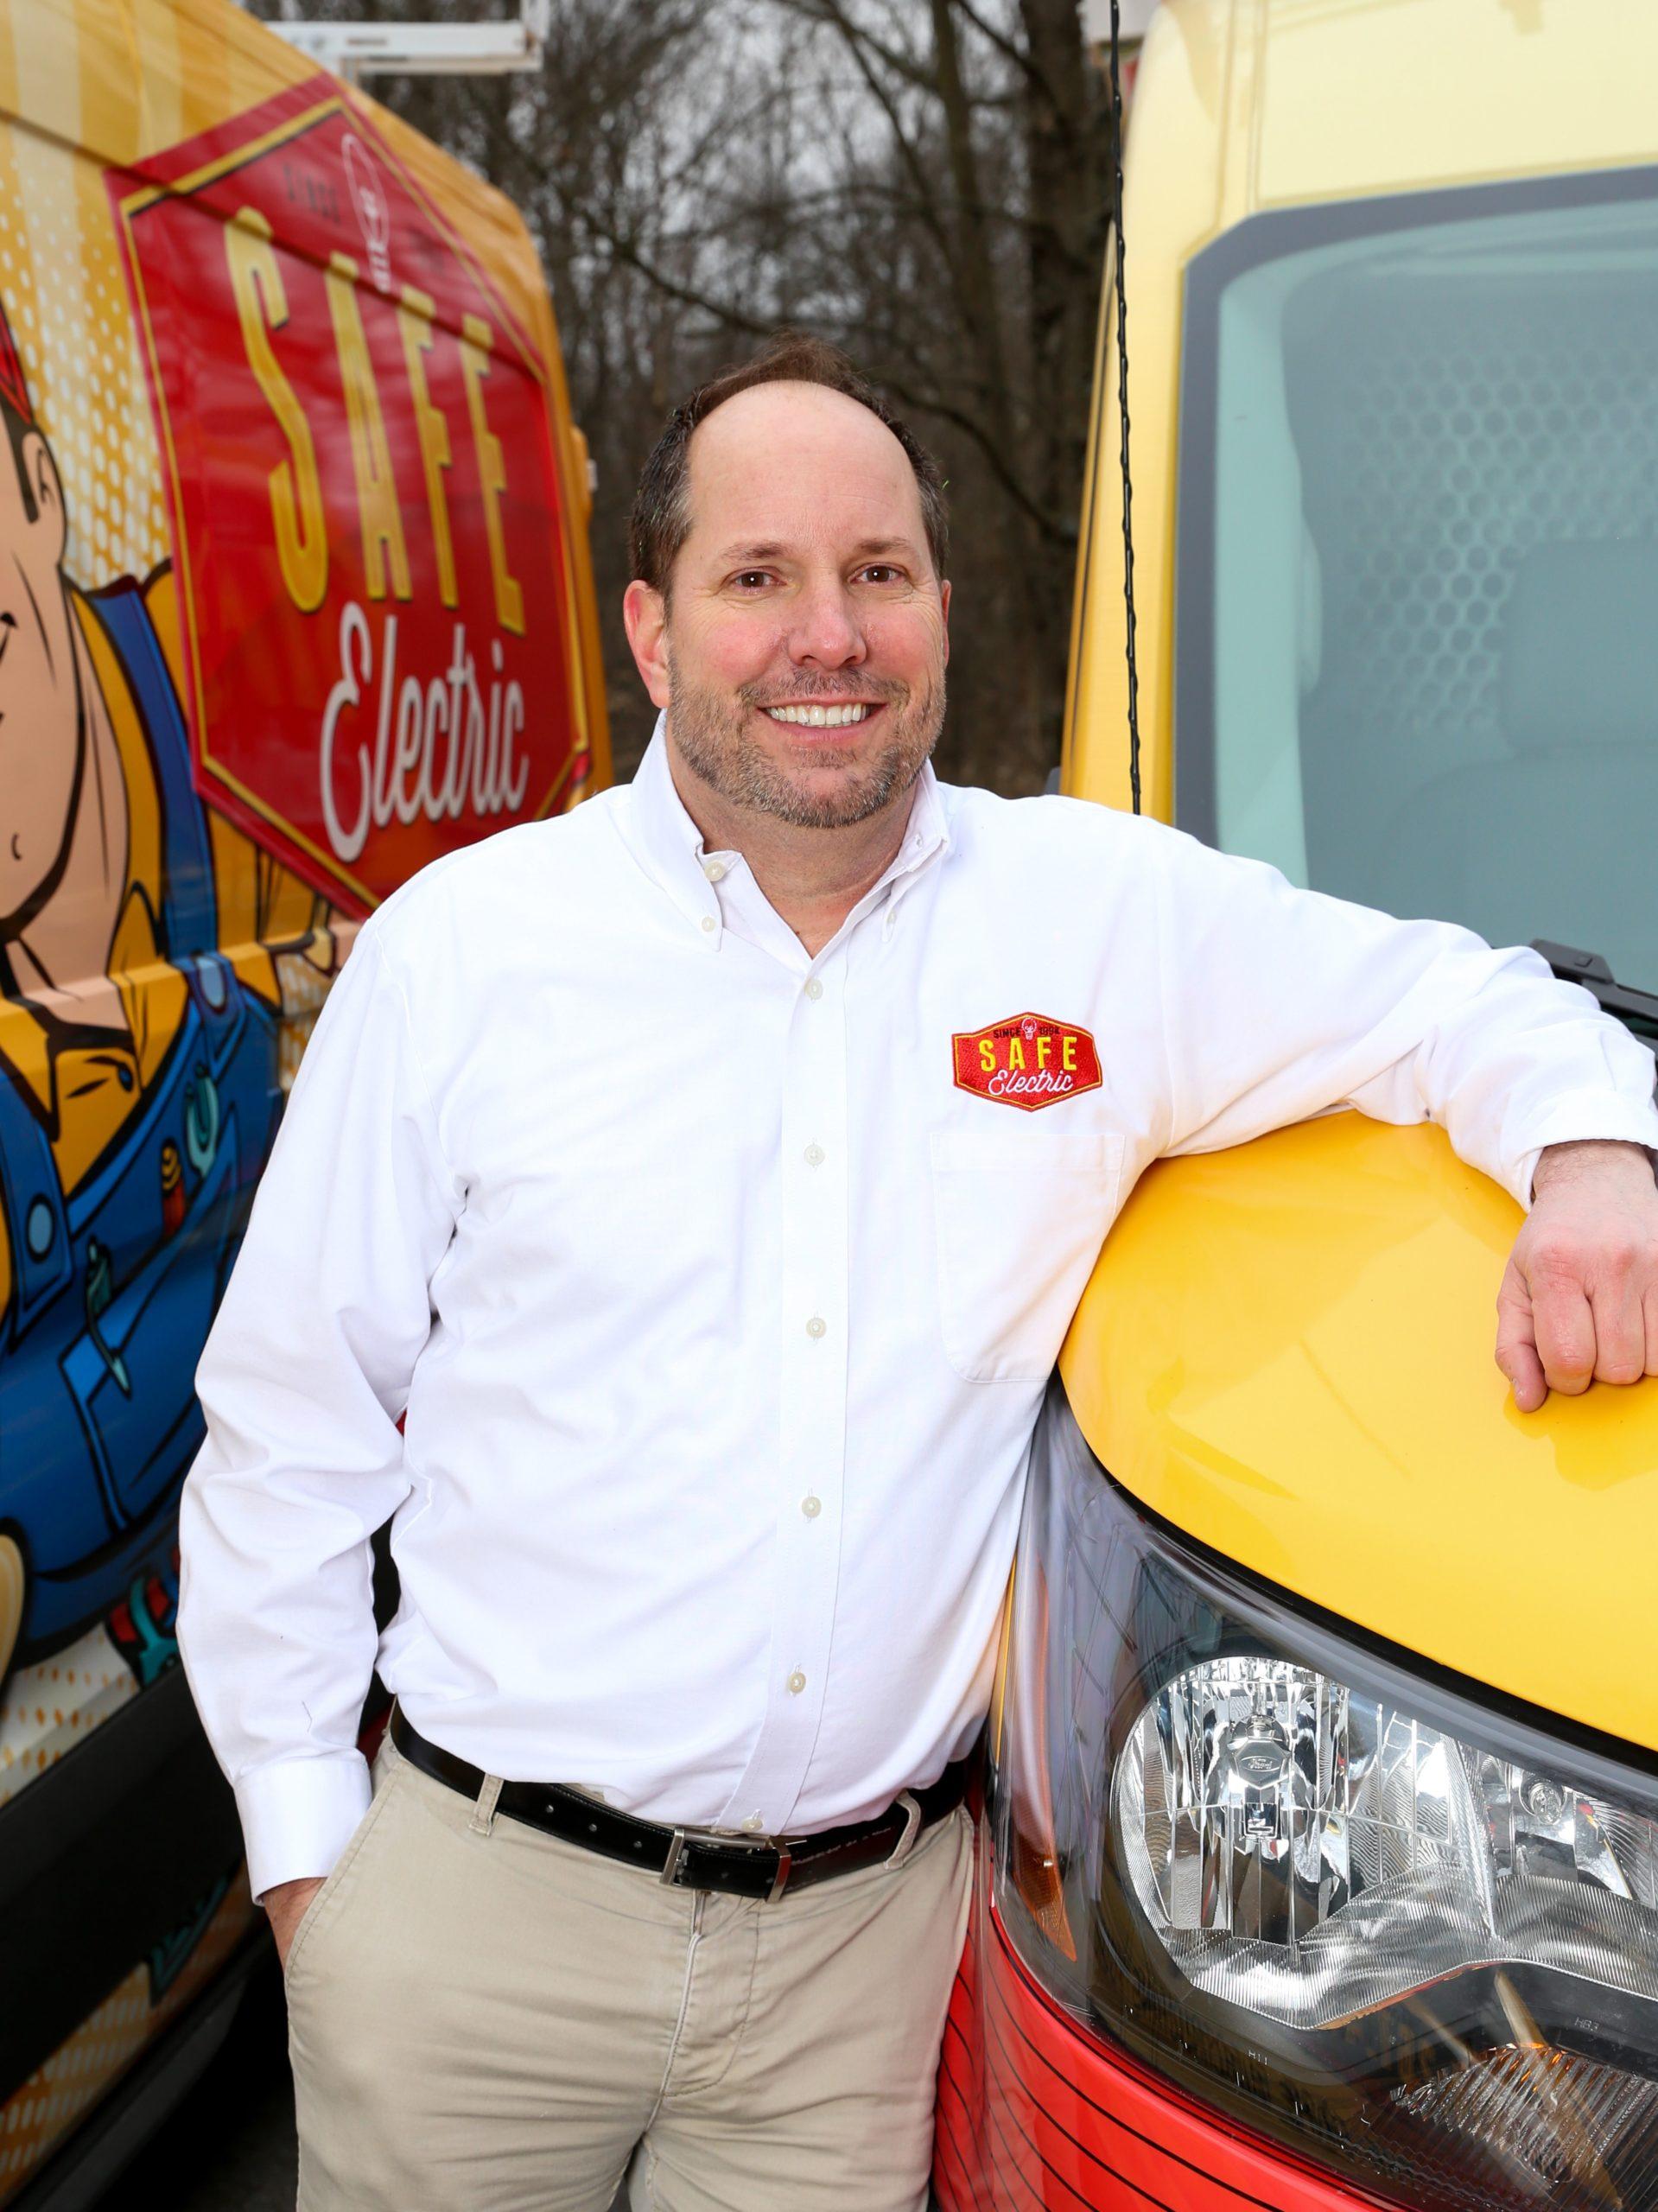 Matt Wehrle - Owner